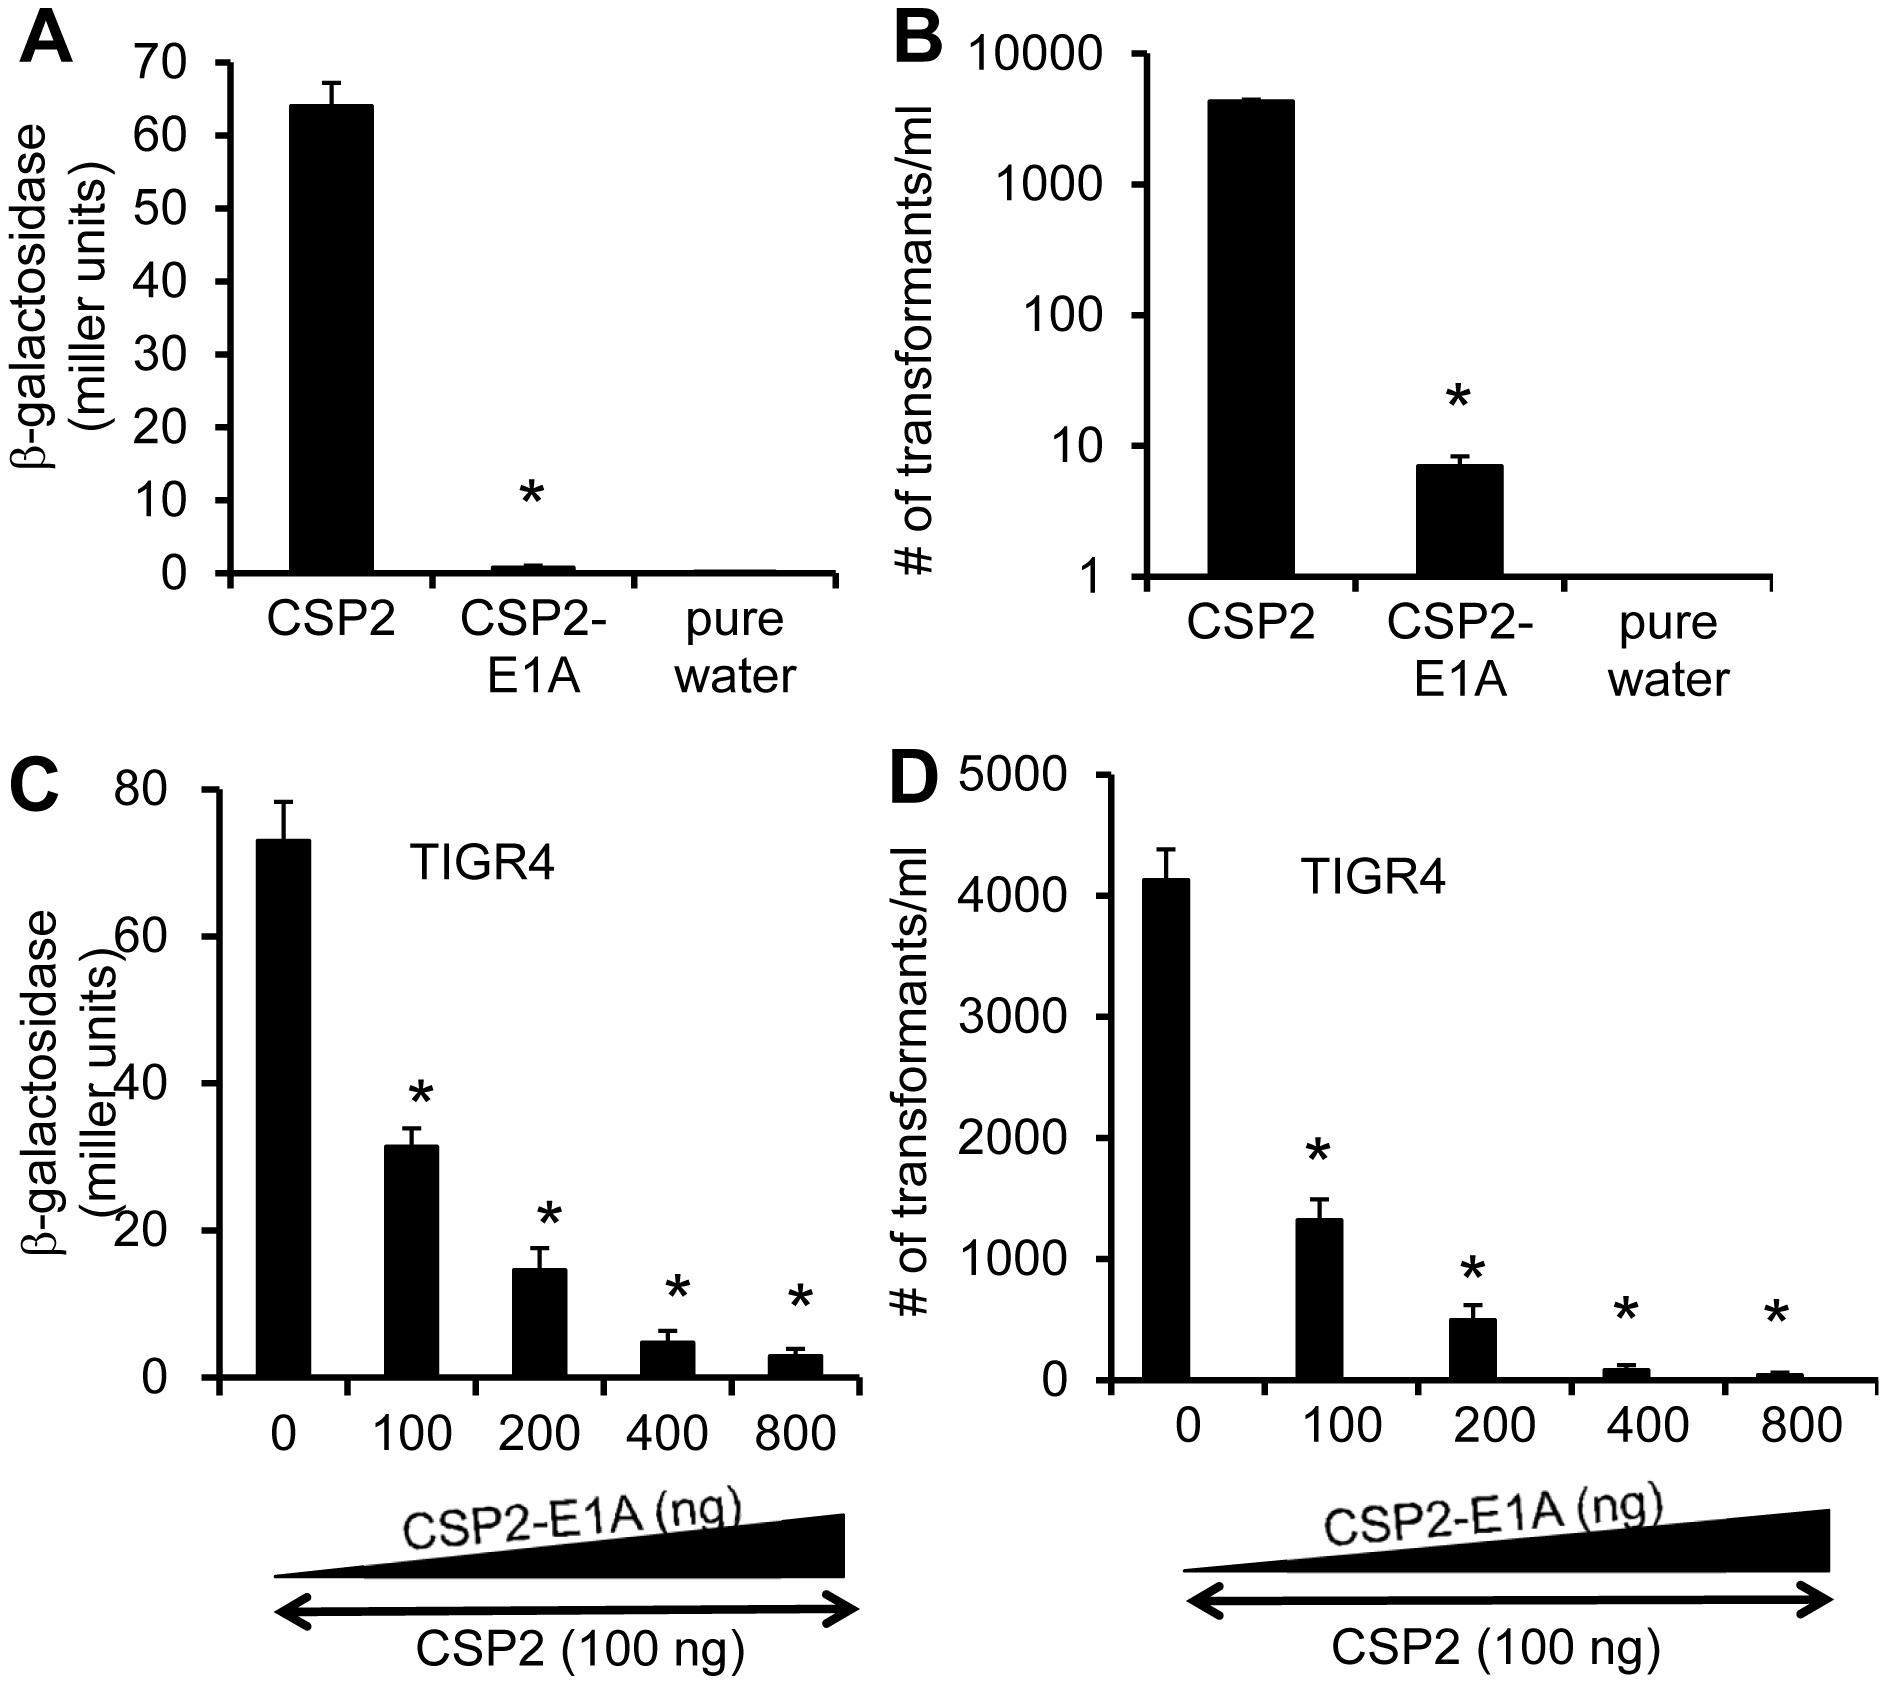 CSP2-E1A inhibits competence development and transformation in ComD2 strain TIGR4.